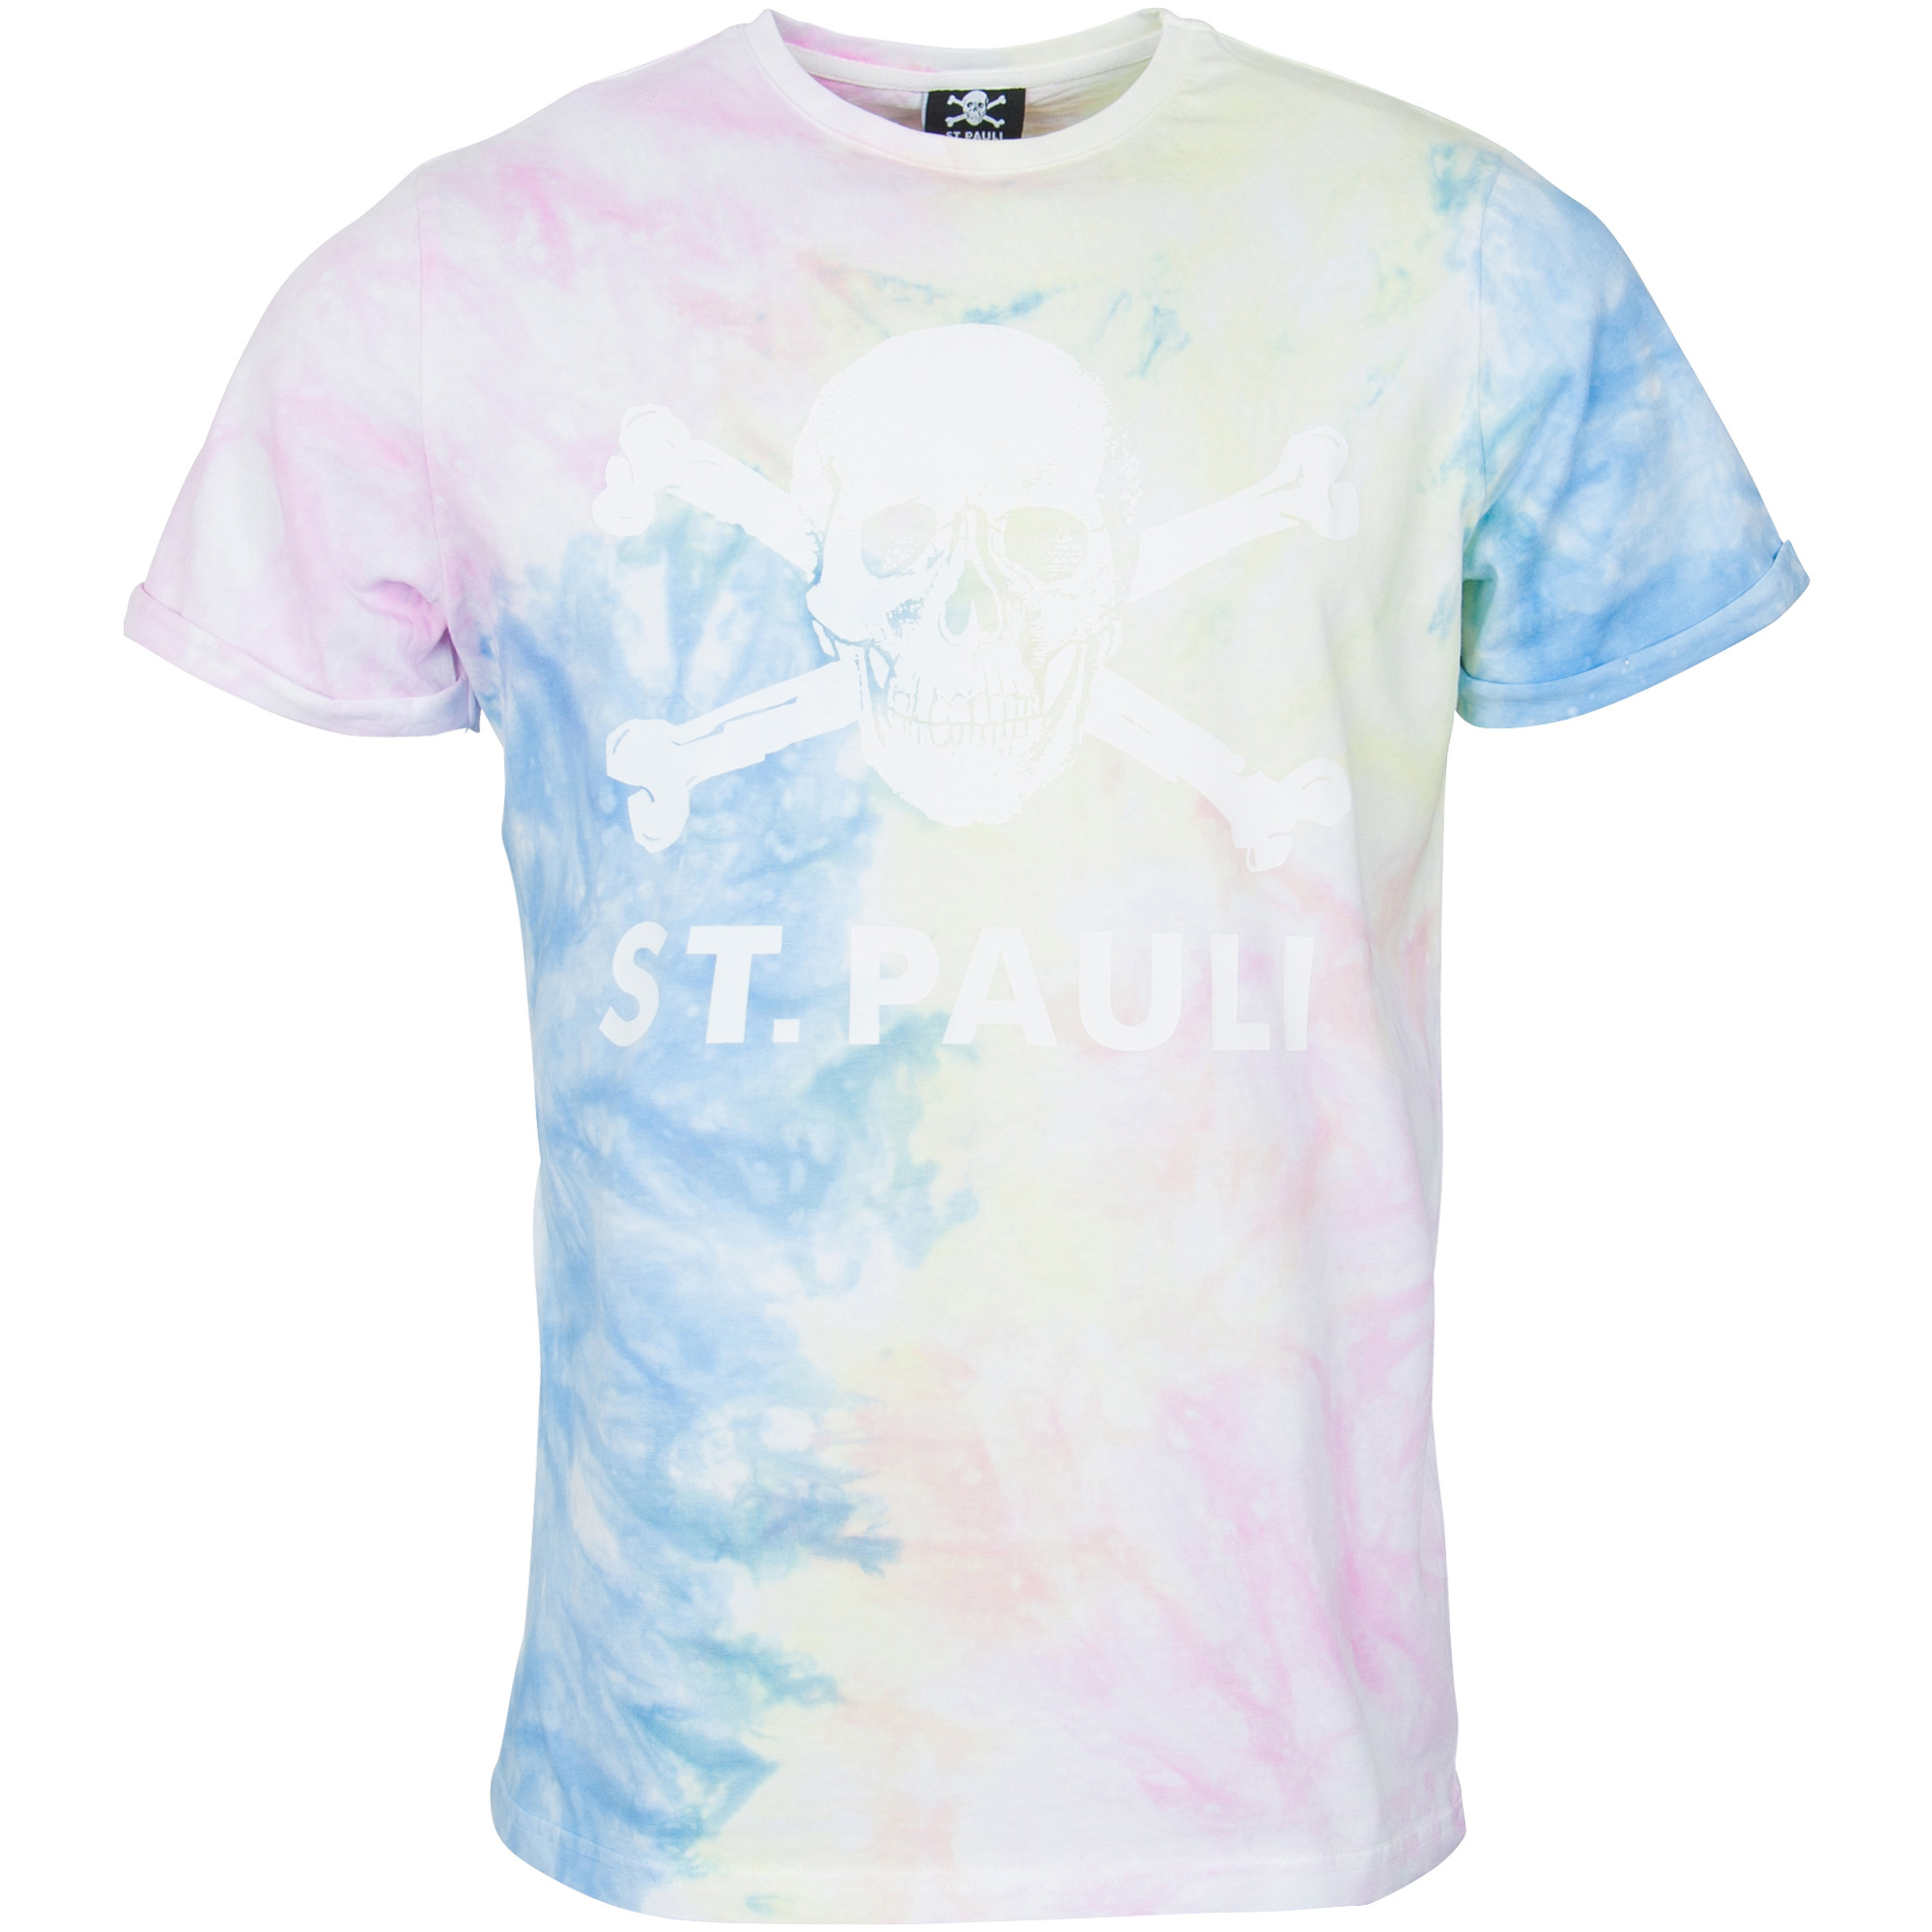 FC St. Pauli - T-Shirt Pastell Batik Totenkopf